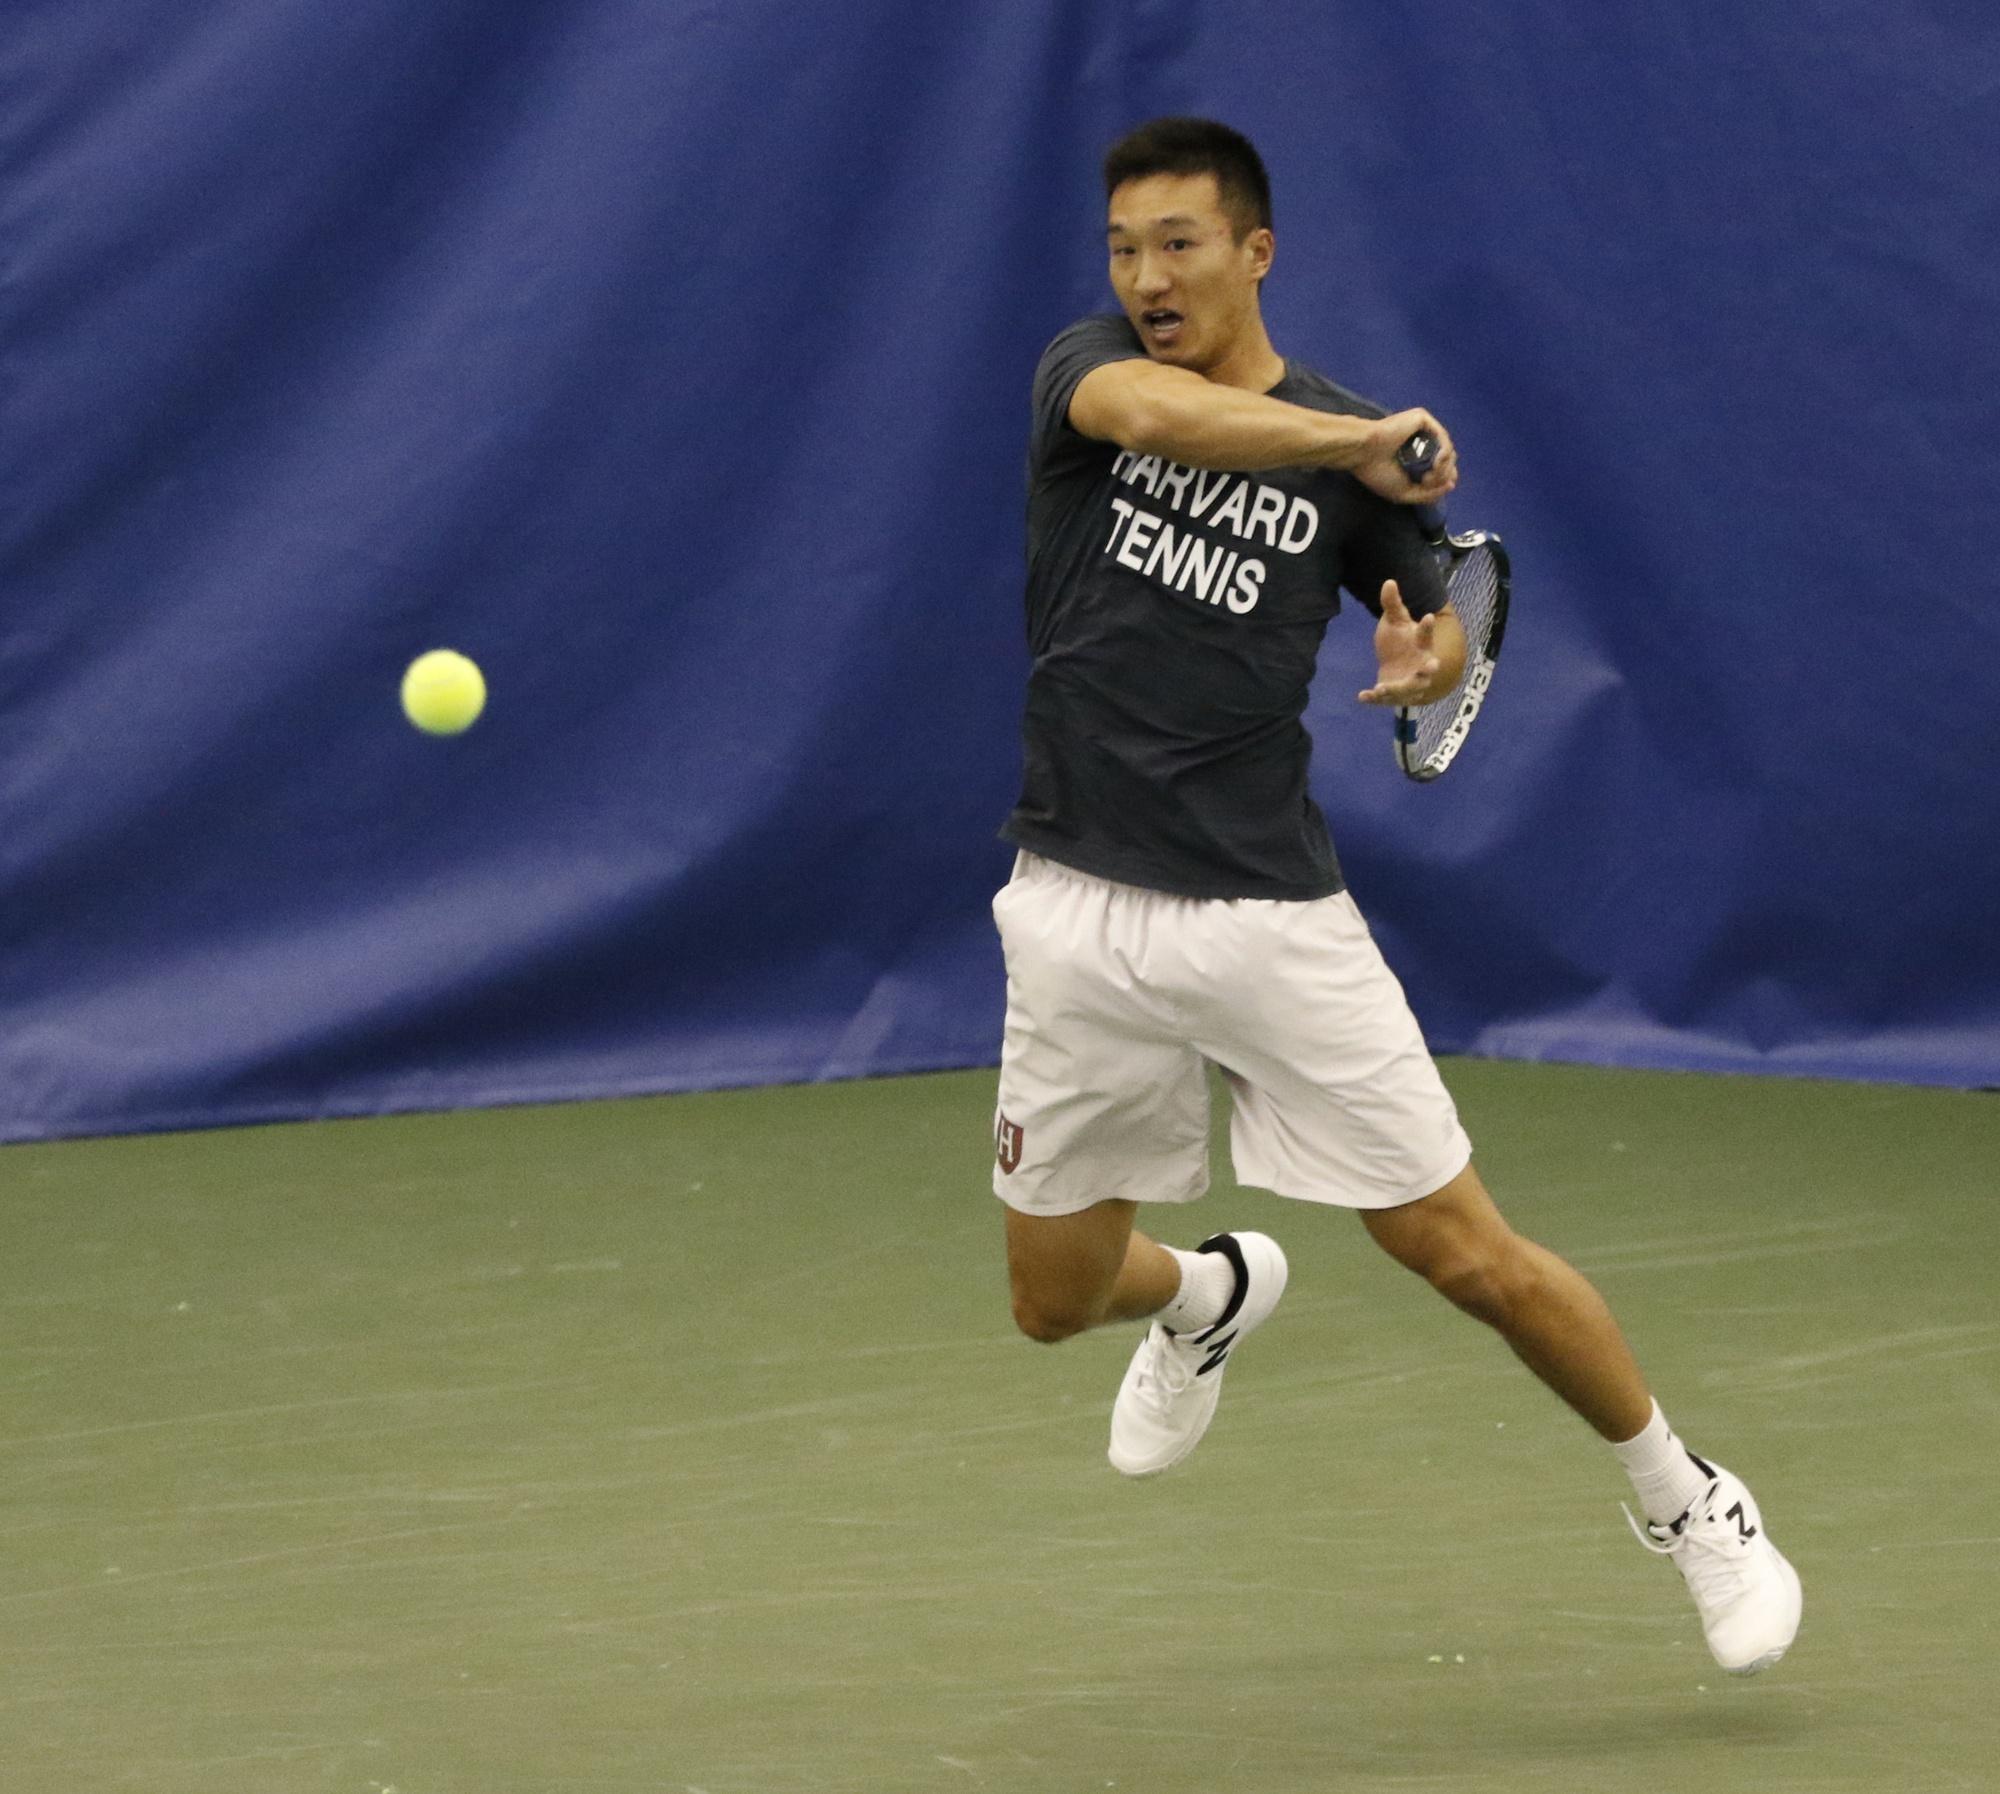 Senior Andy Zhou is a co-captain on the men's side, alongside classmate Christopher Morrow.